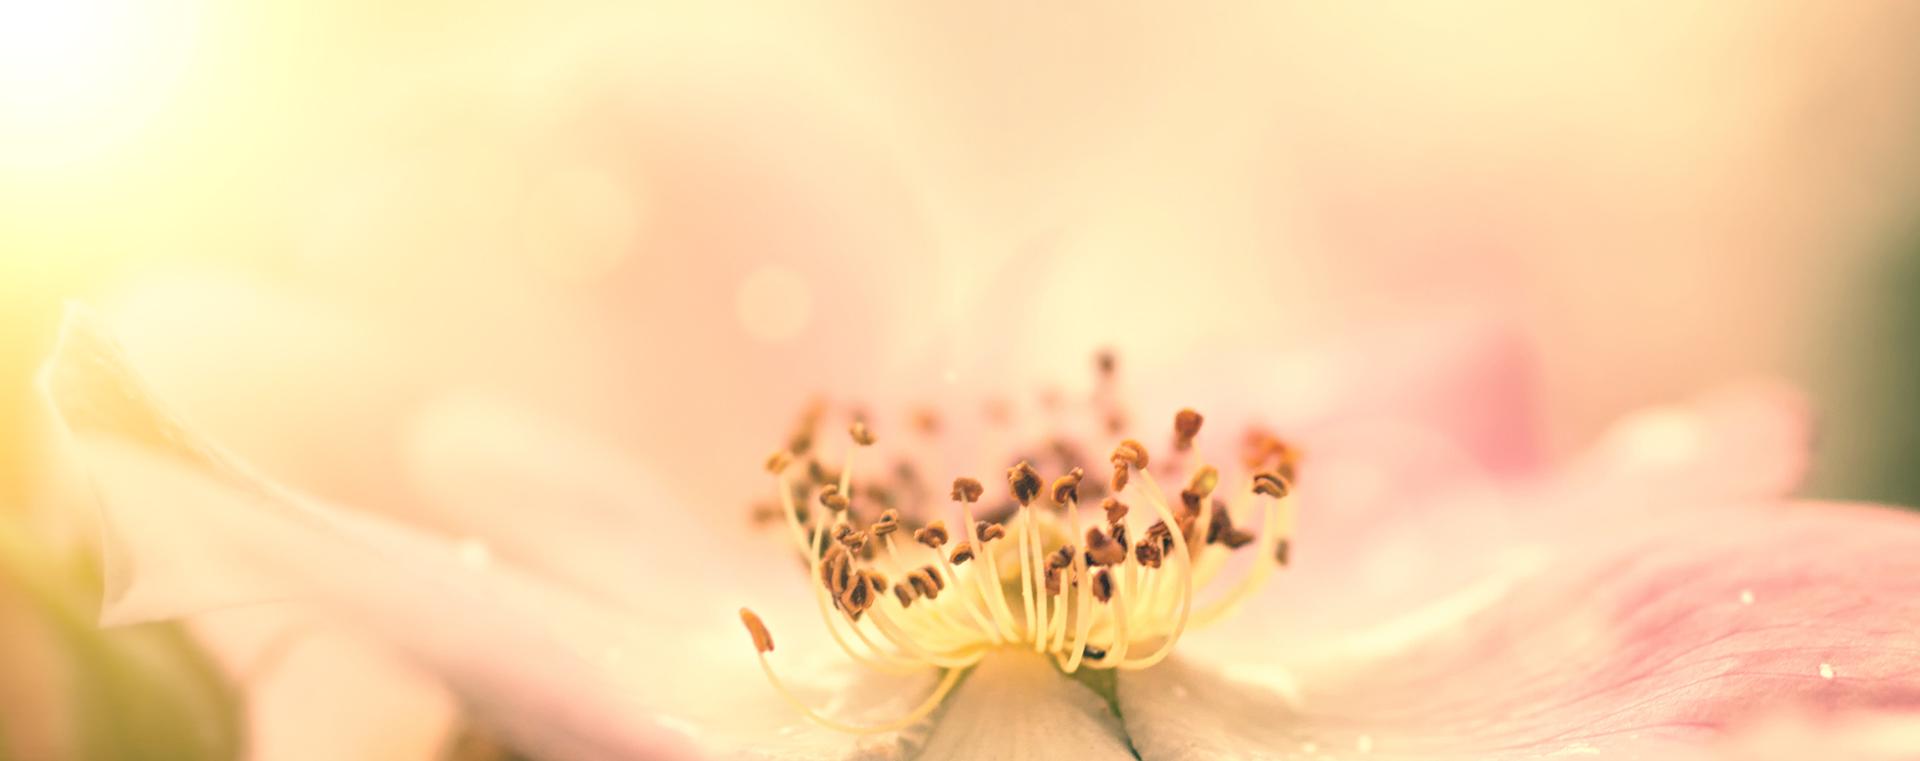 Nr 37 Wild Rose Heckenrose Desinteresse an der Gegenwart Lemon Pharma Original Bachblüten Dr. Bach